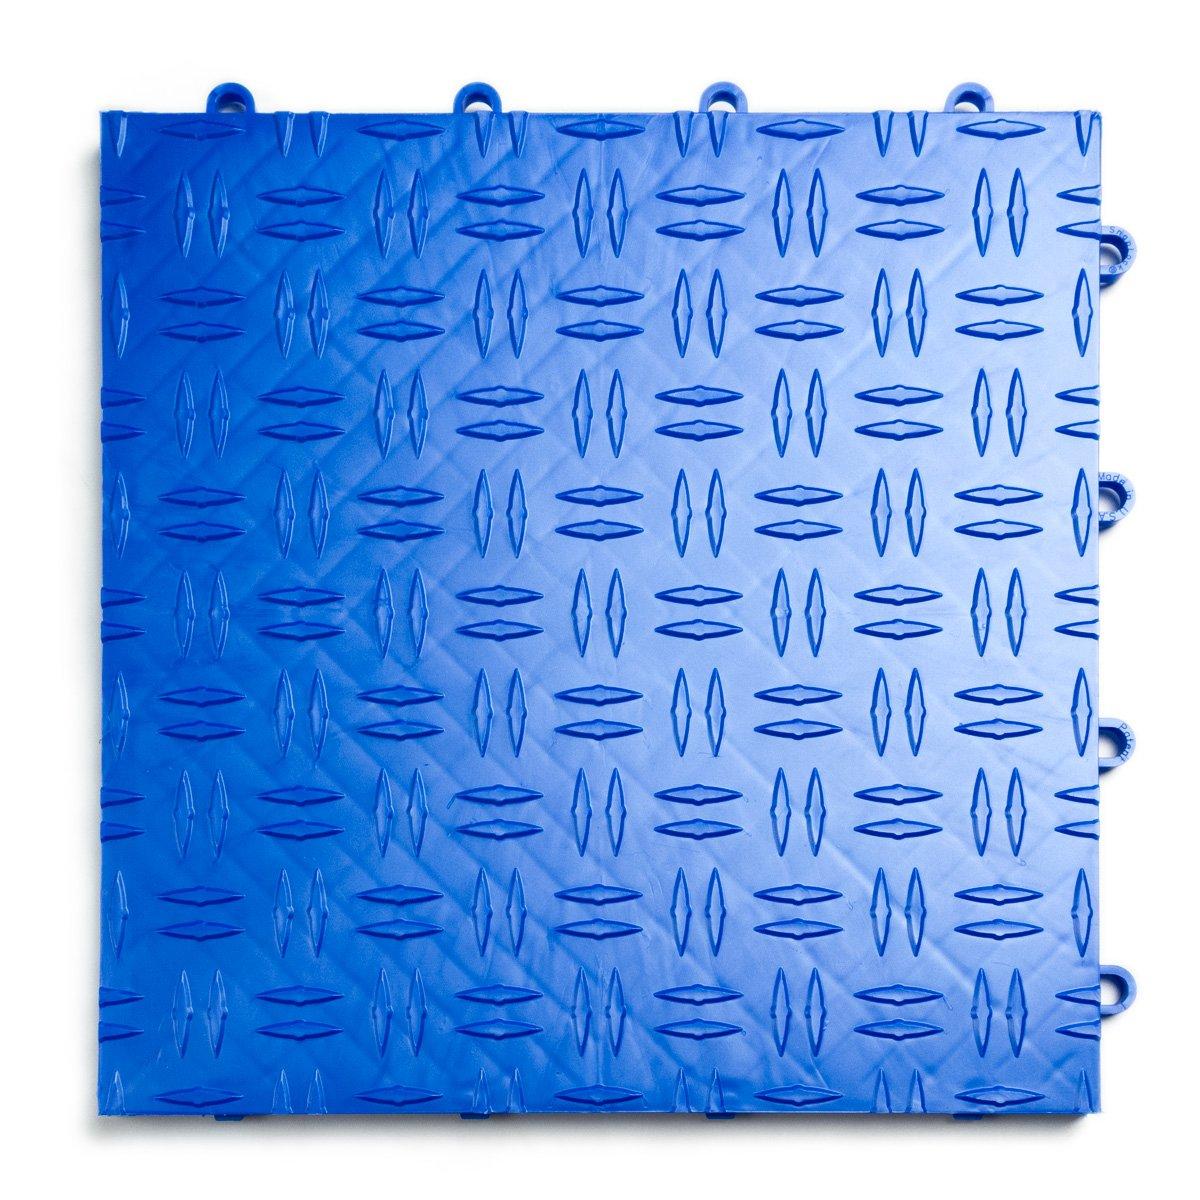 GarageTrac Diamond Durable Interlocking Modular Garage Flooring Tile Royal Blue 48 Pack Rubber ...